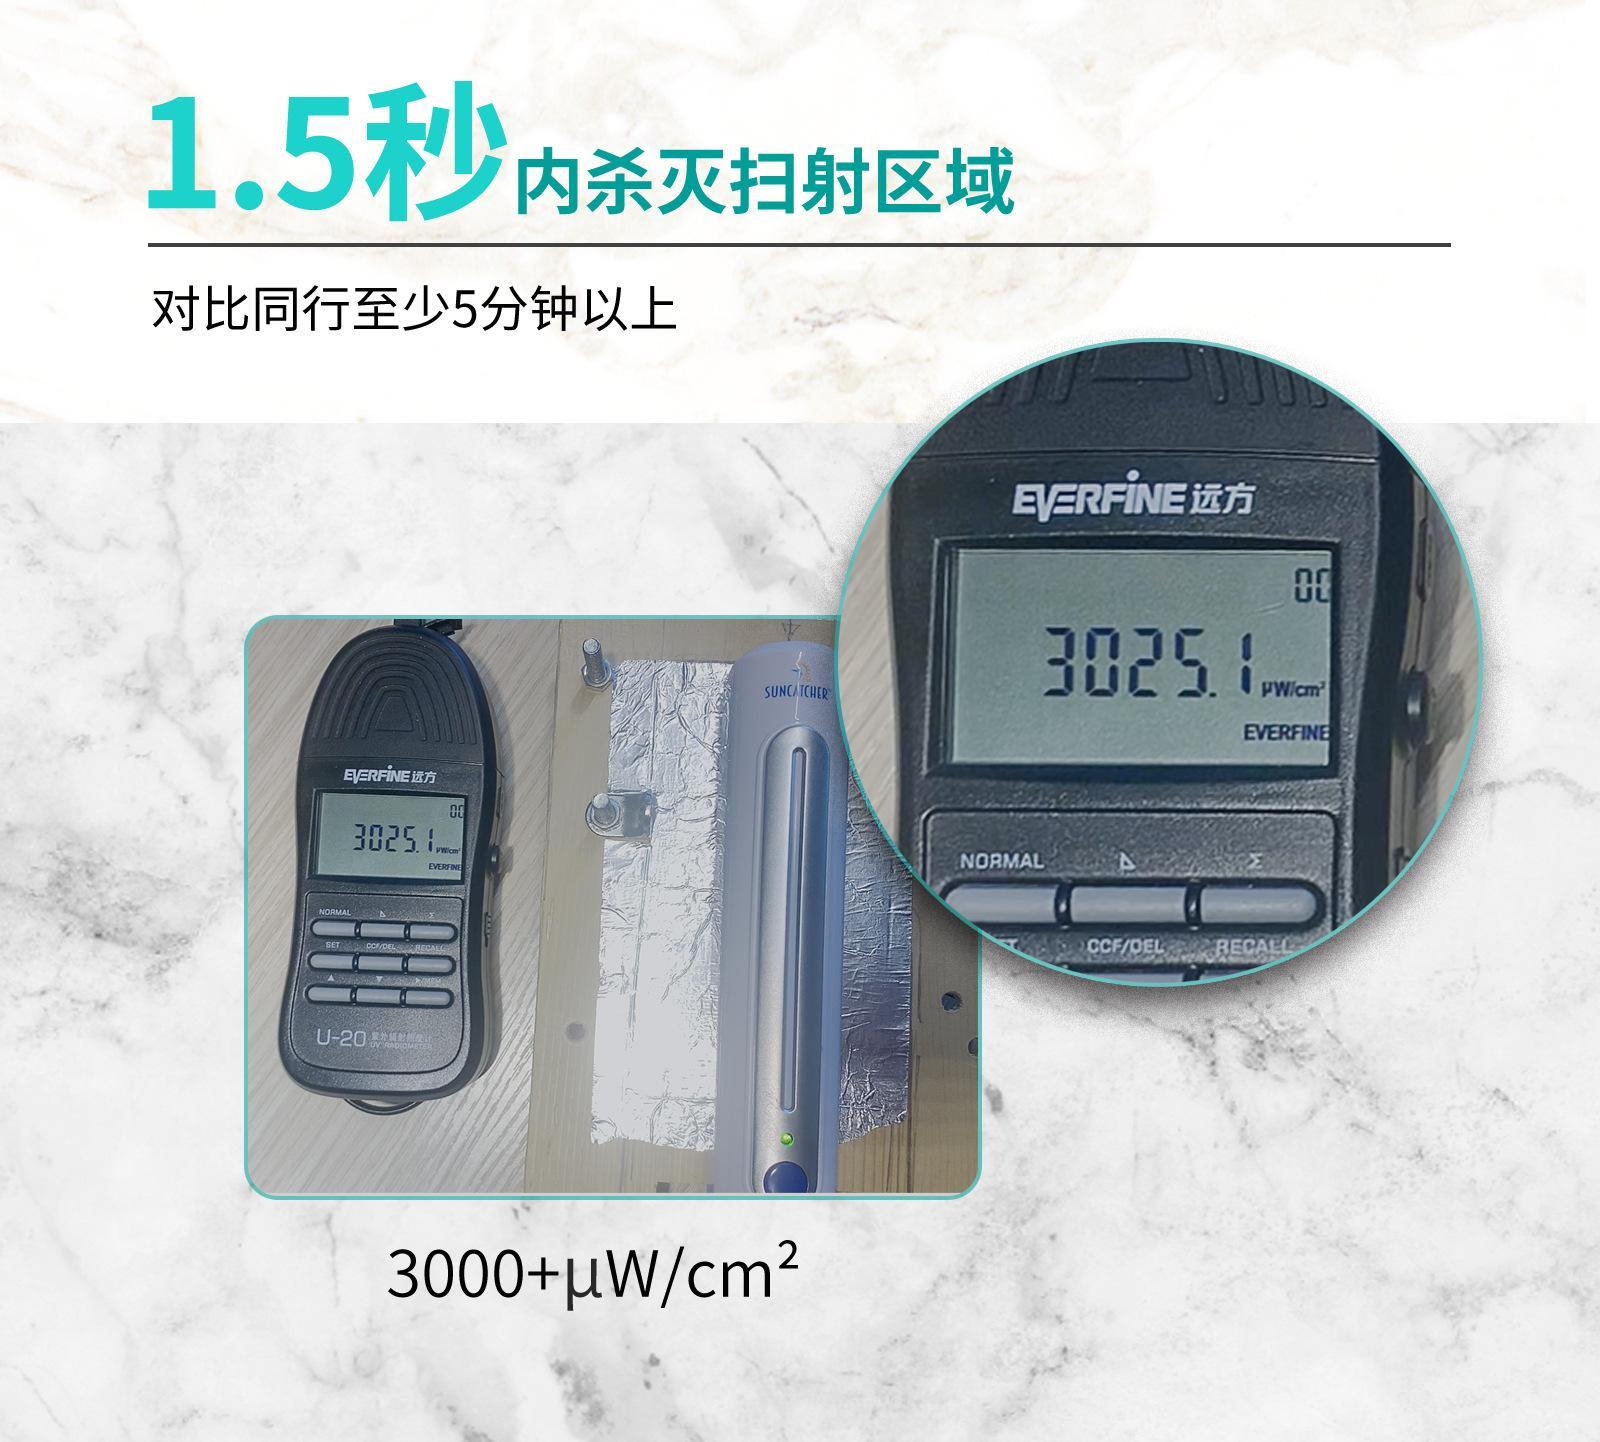 Handheld UV disinfection lamp 13